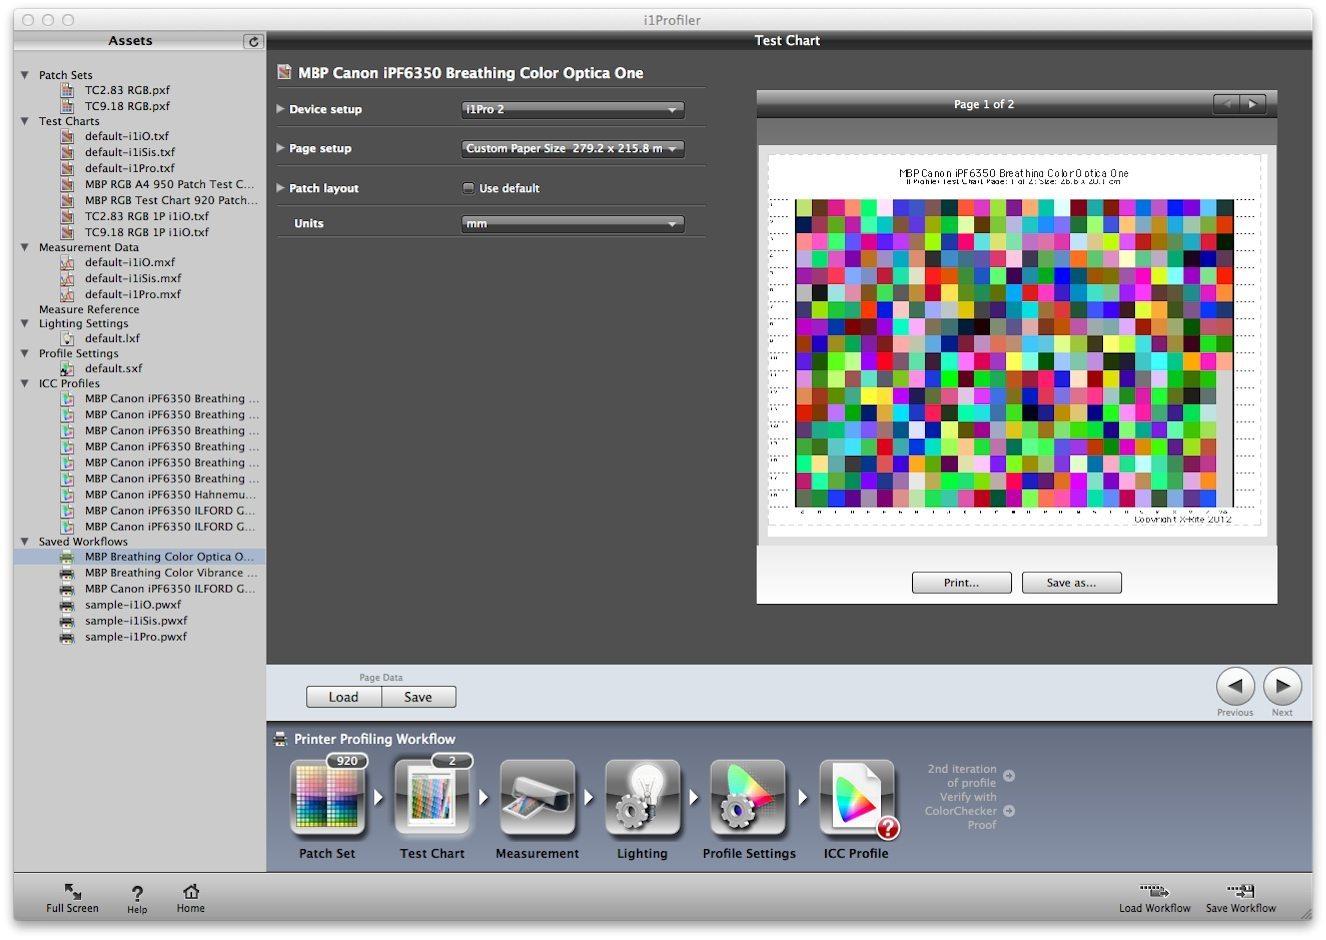 Printer_Profiling_Targets[1].jpg